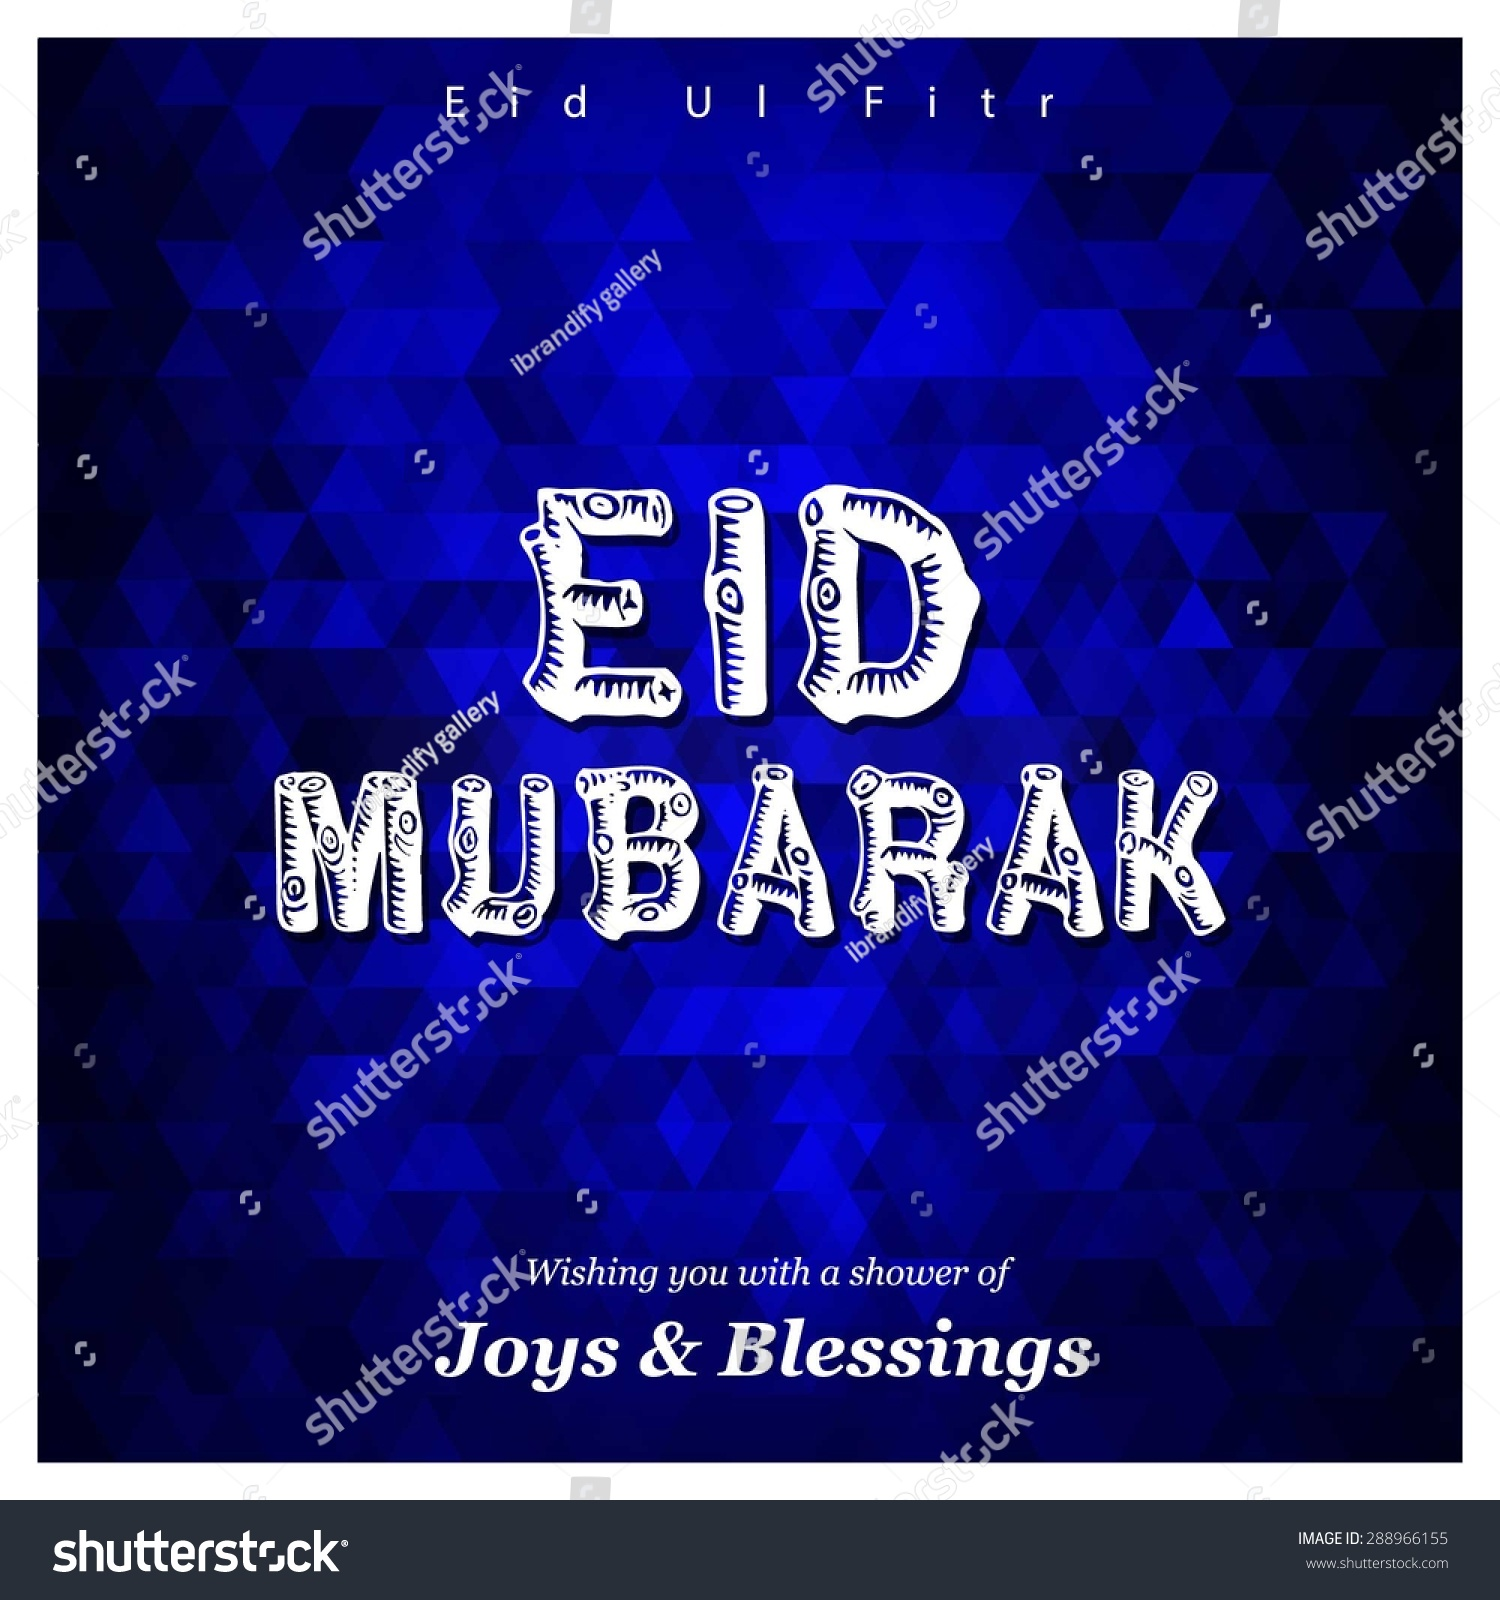 Joys blessings eid mubarak vintage greeting stock vector 288966155 joys blessings eid mubarak vintage greeting card template kristyandbryce Image collections